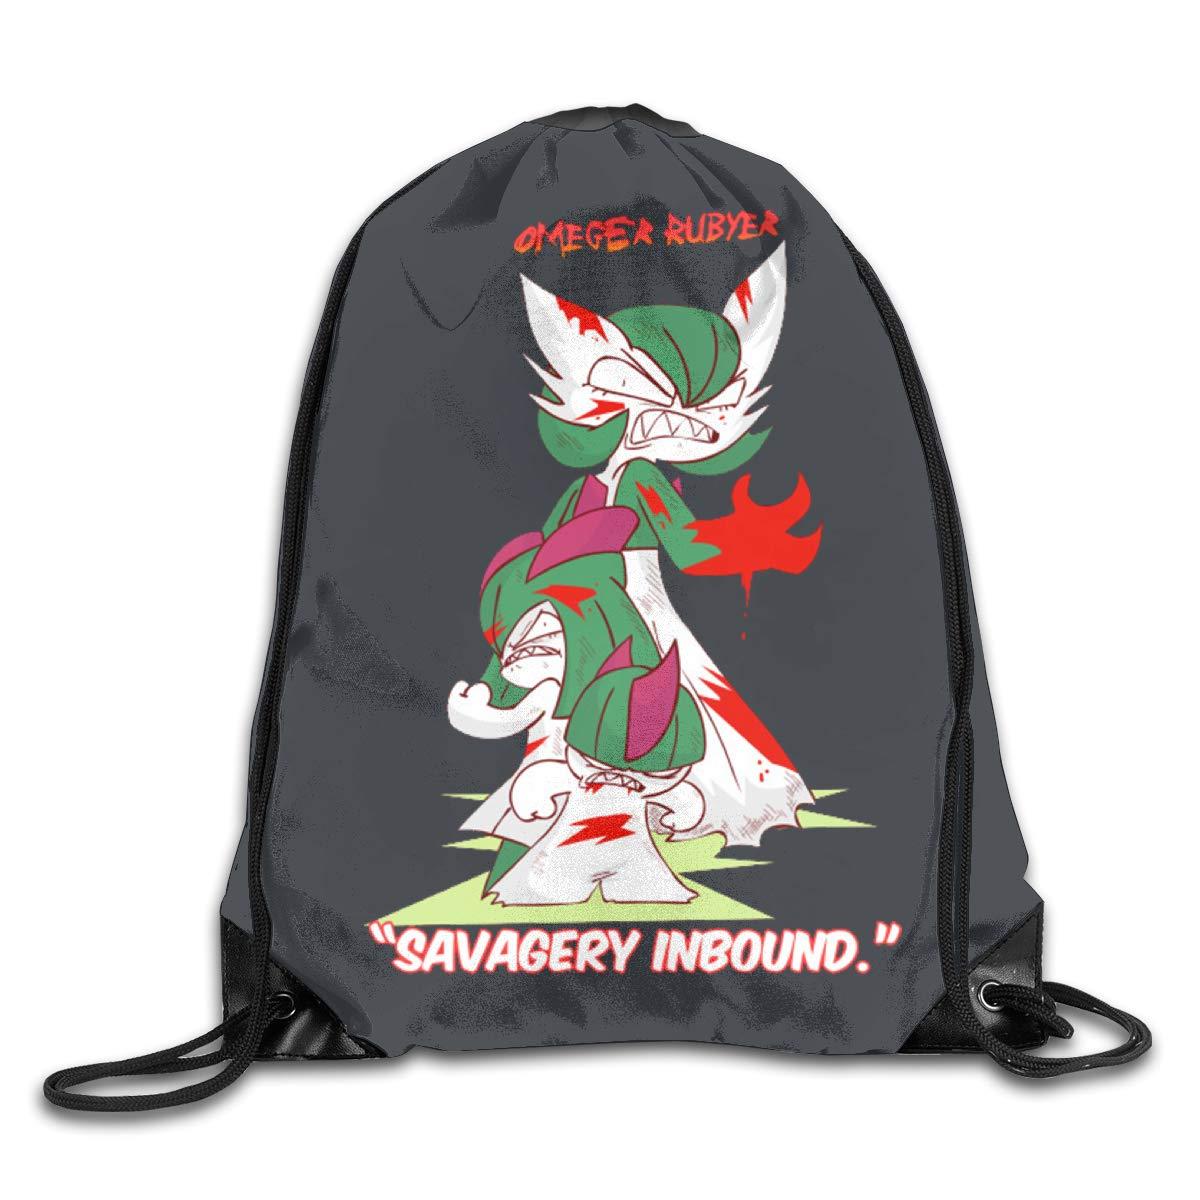 WABAODAN Gloverfield Savage 3D Printing Unisex Classic Drawstring String Bag One Size